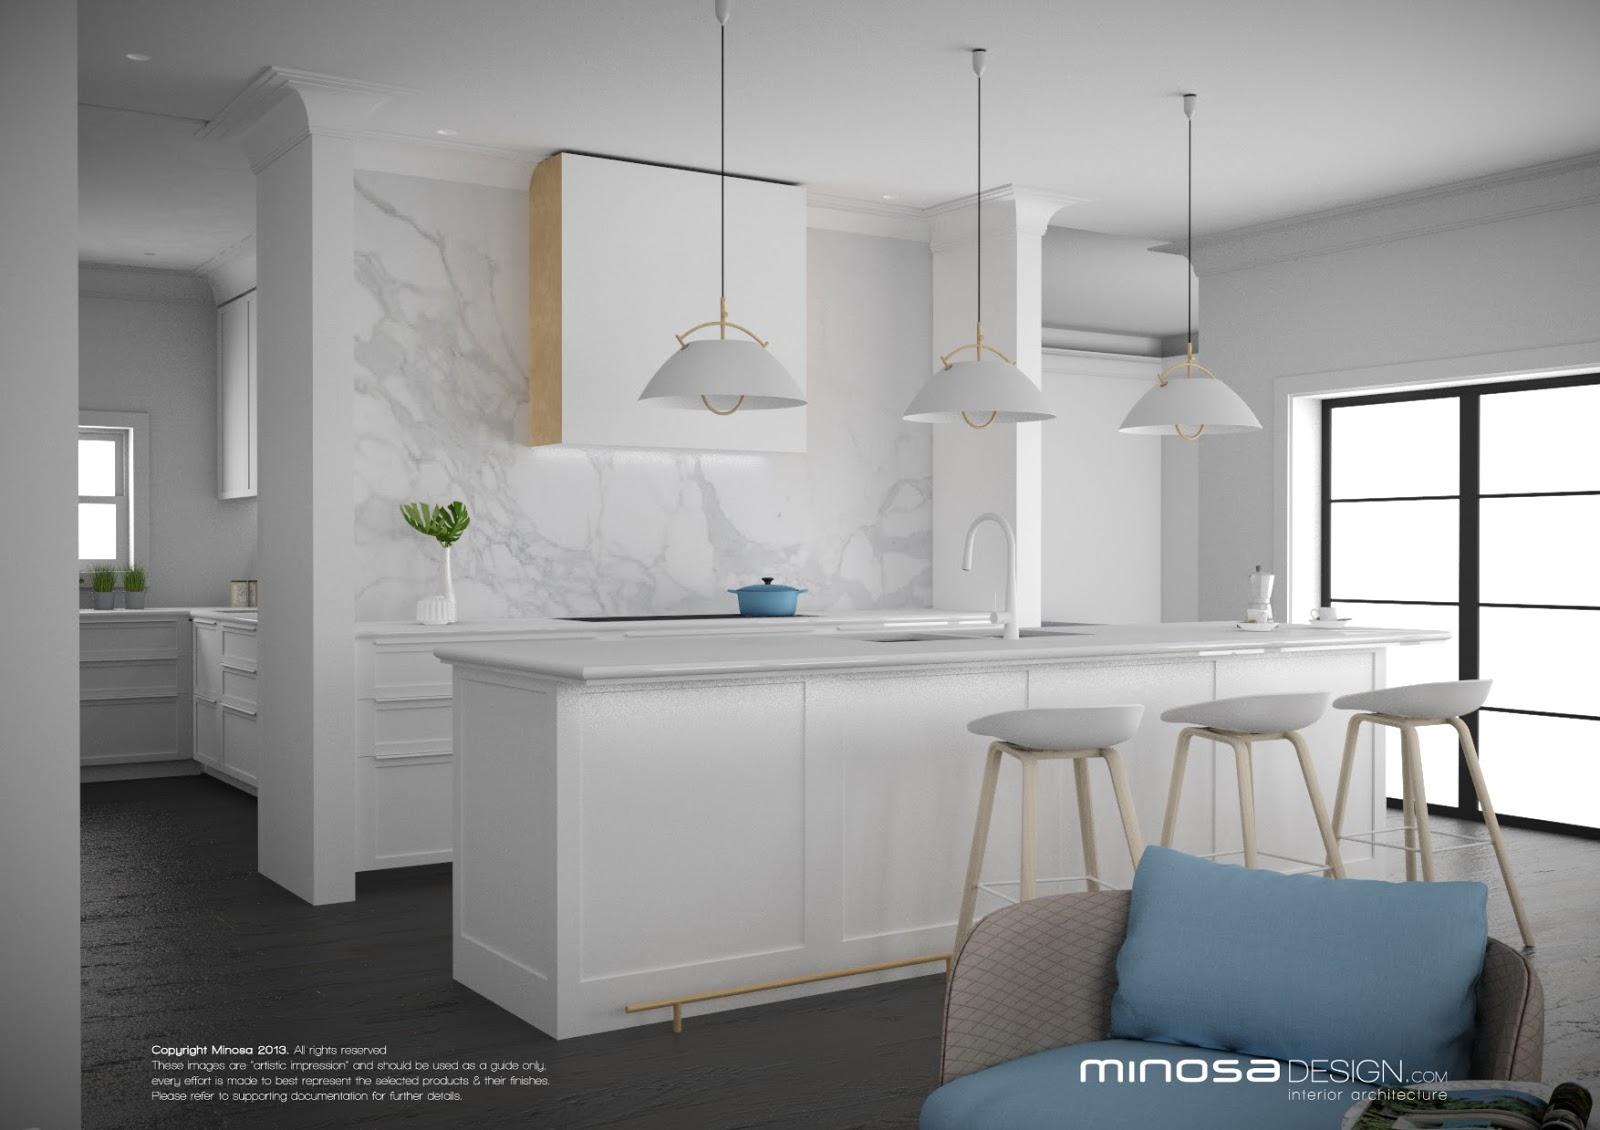 minosa hampton 39 s kitchen minosa style. Black Bedroom Furniture Sets. Home Design Ideas